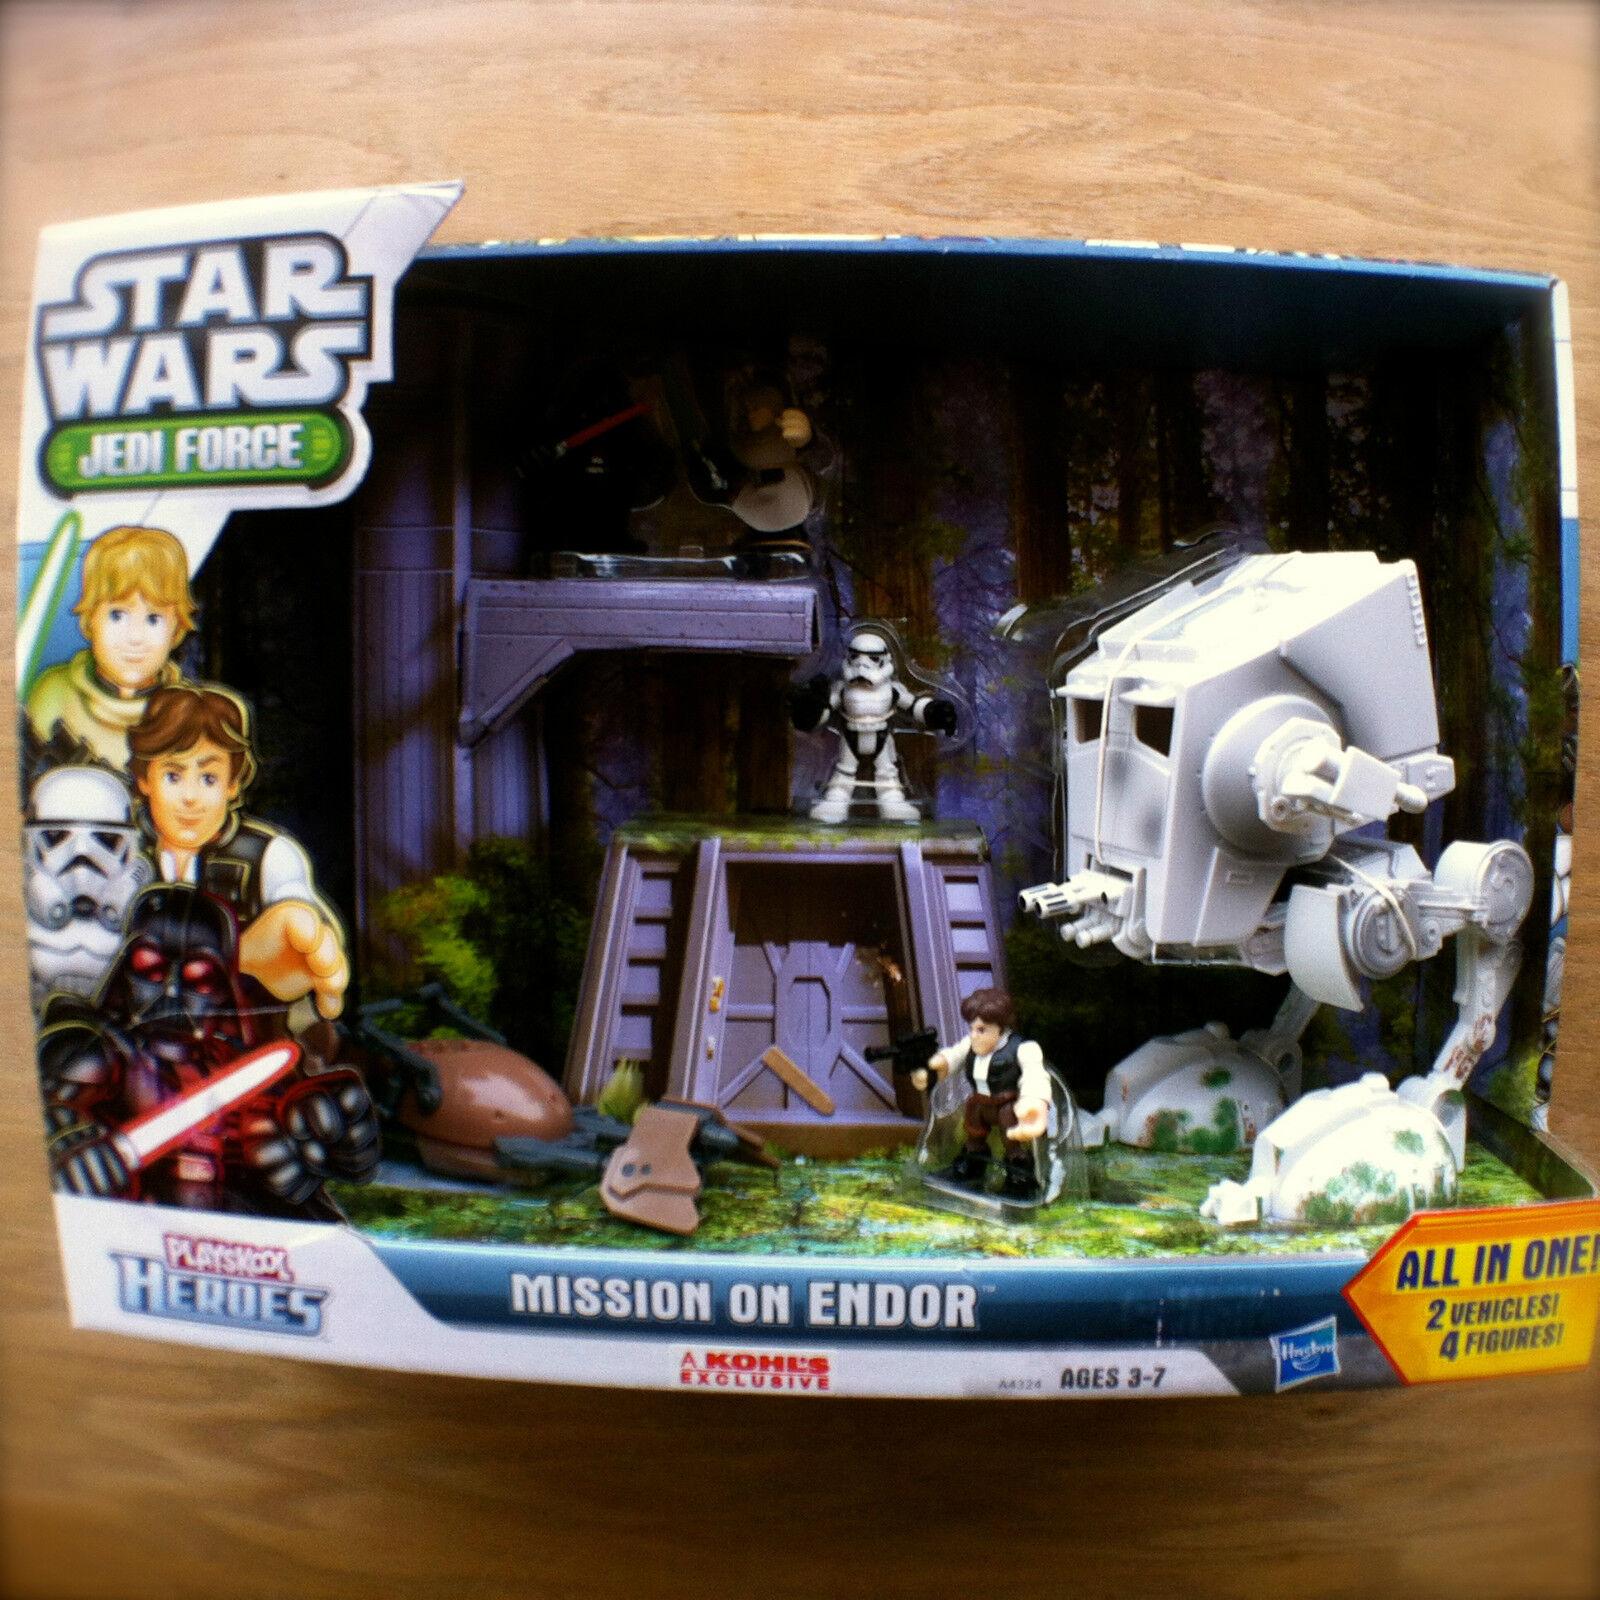 STAR WARS Jedi Force MISSION ON ENDOR 2 Vehicles 4 Guys PLAYSKOOL HEROES Hasbro